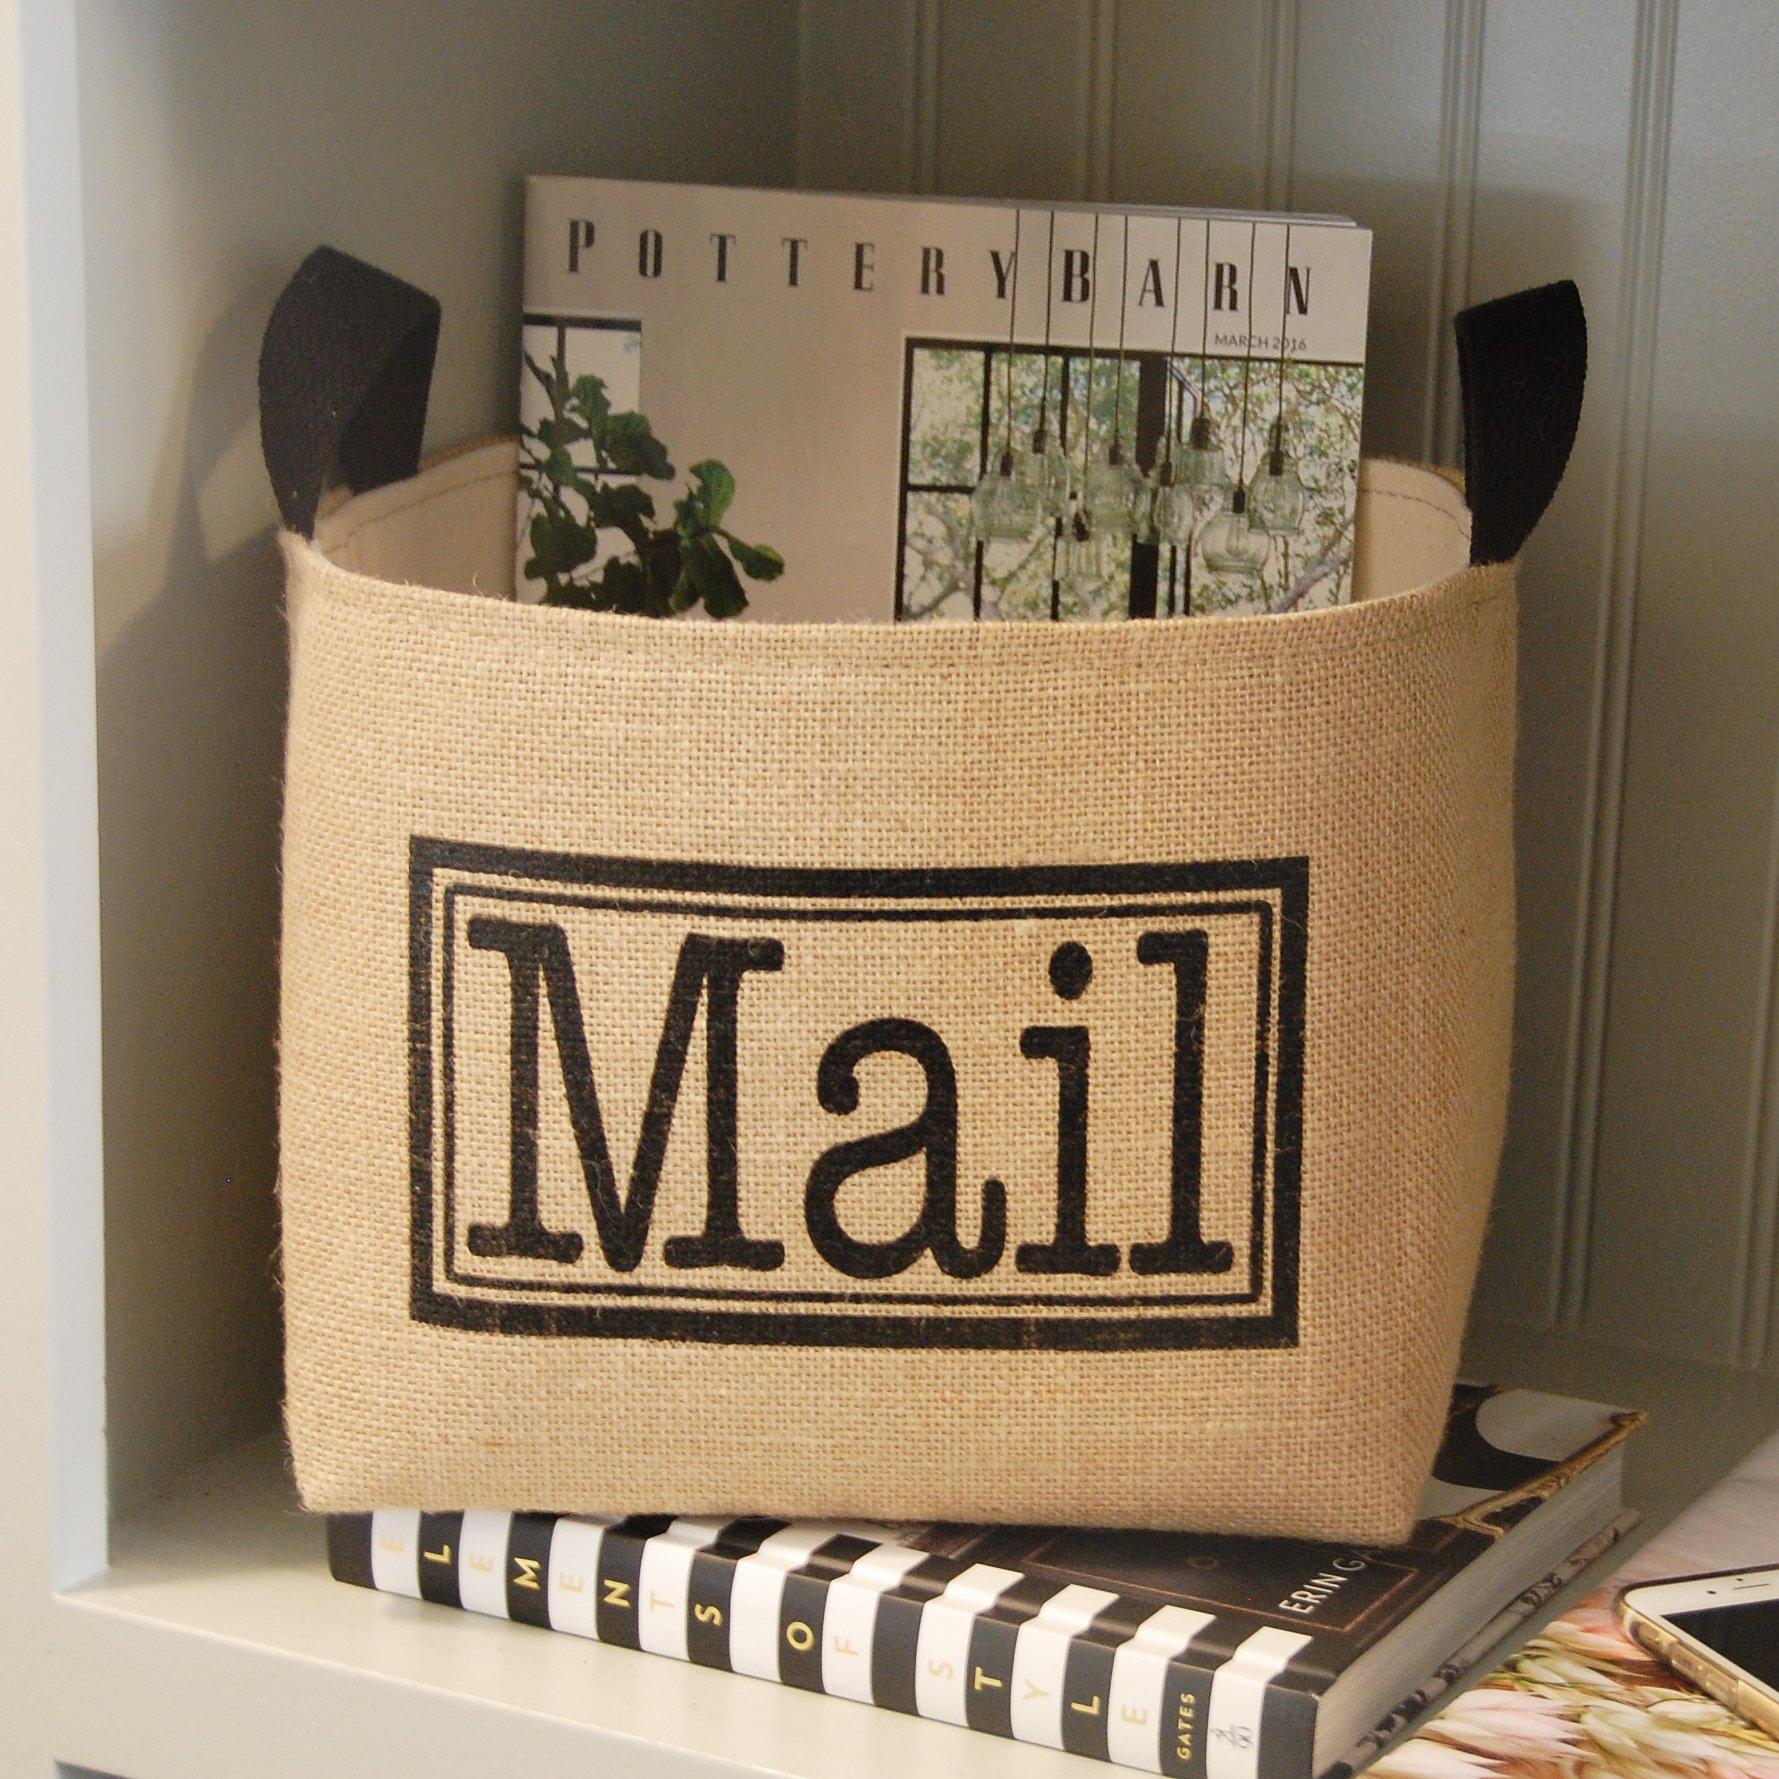 A Southern Bucket Mail Organizer Burlap Storage Basket, Black/Natural Jute/Unbleached Canvas